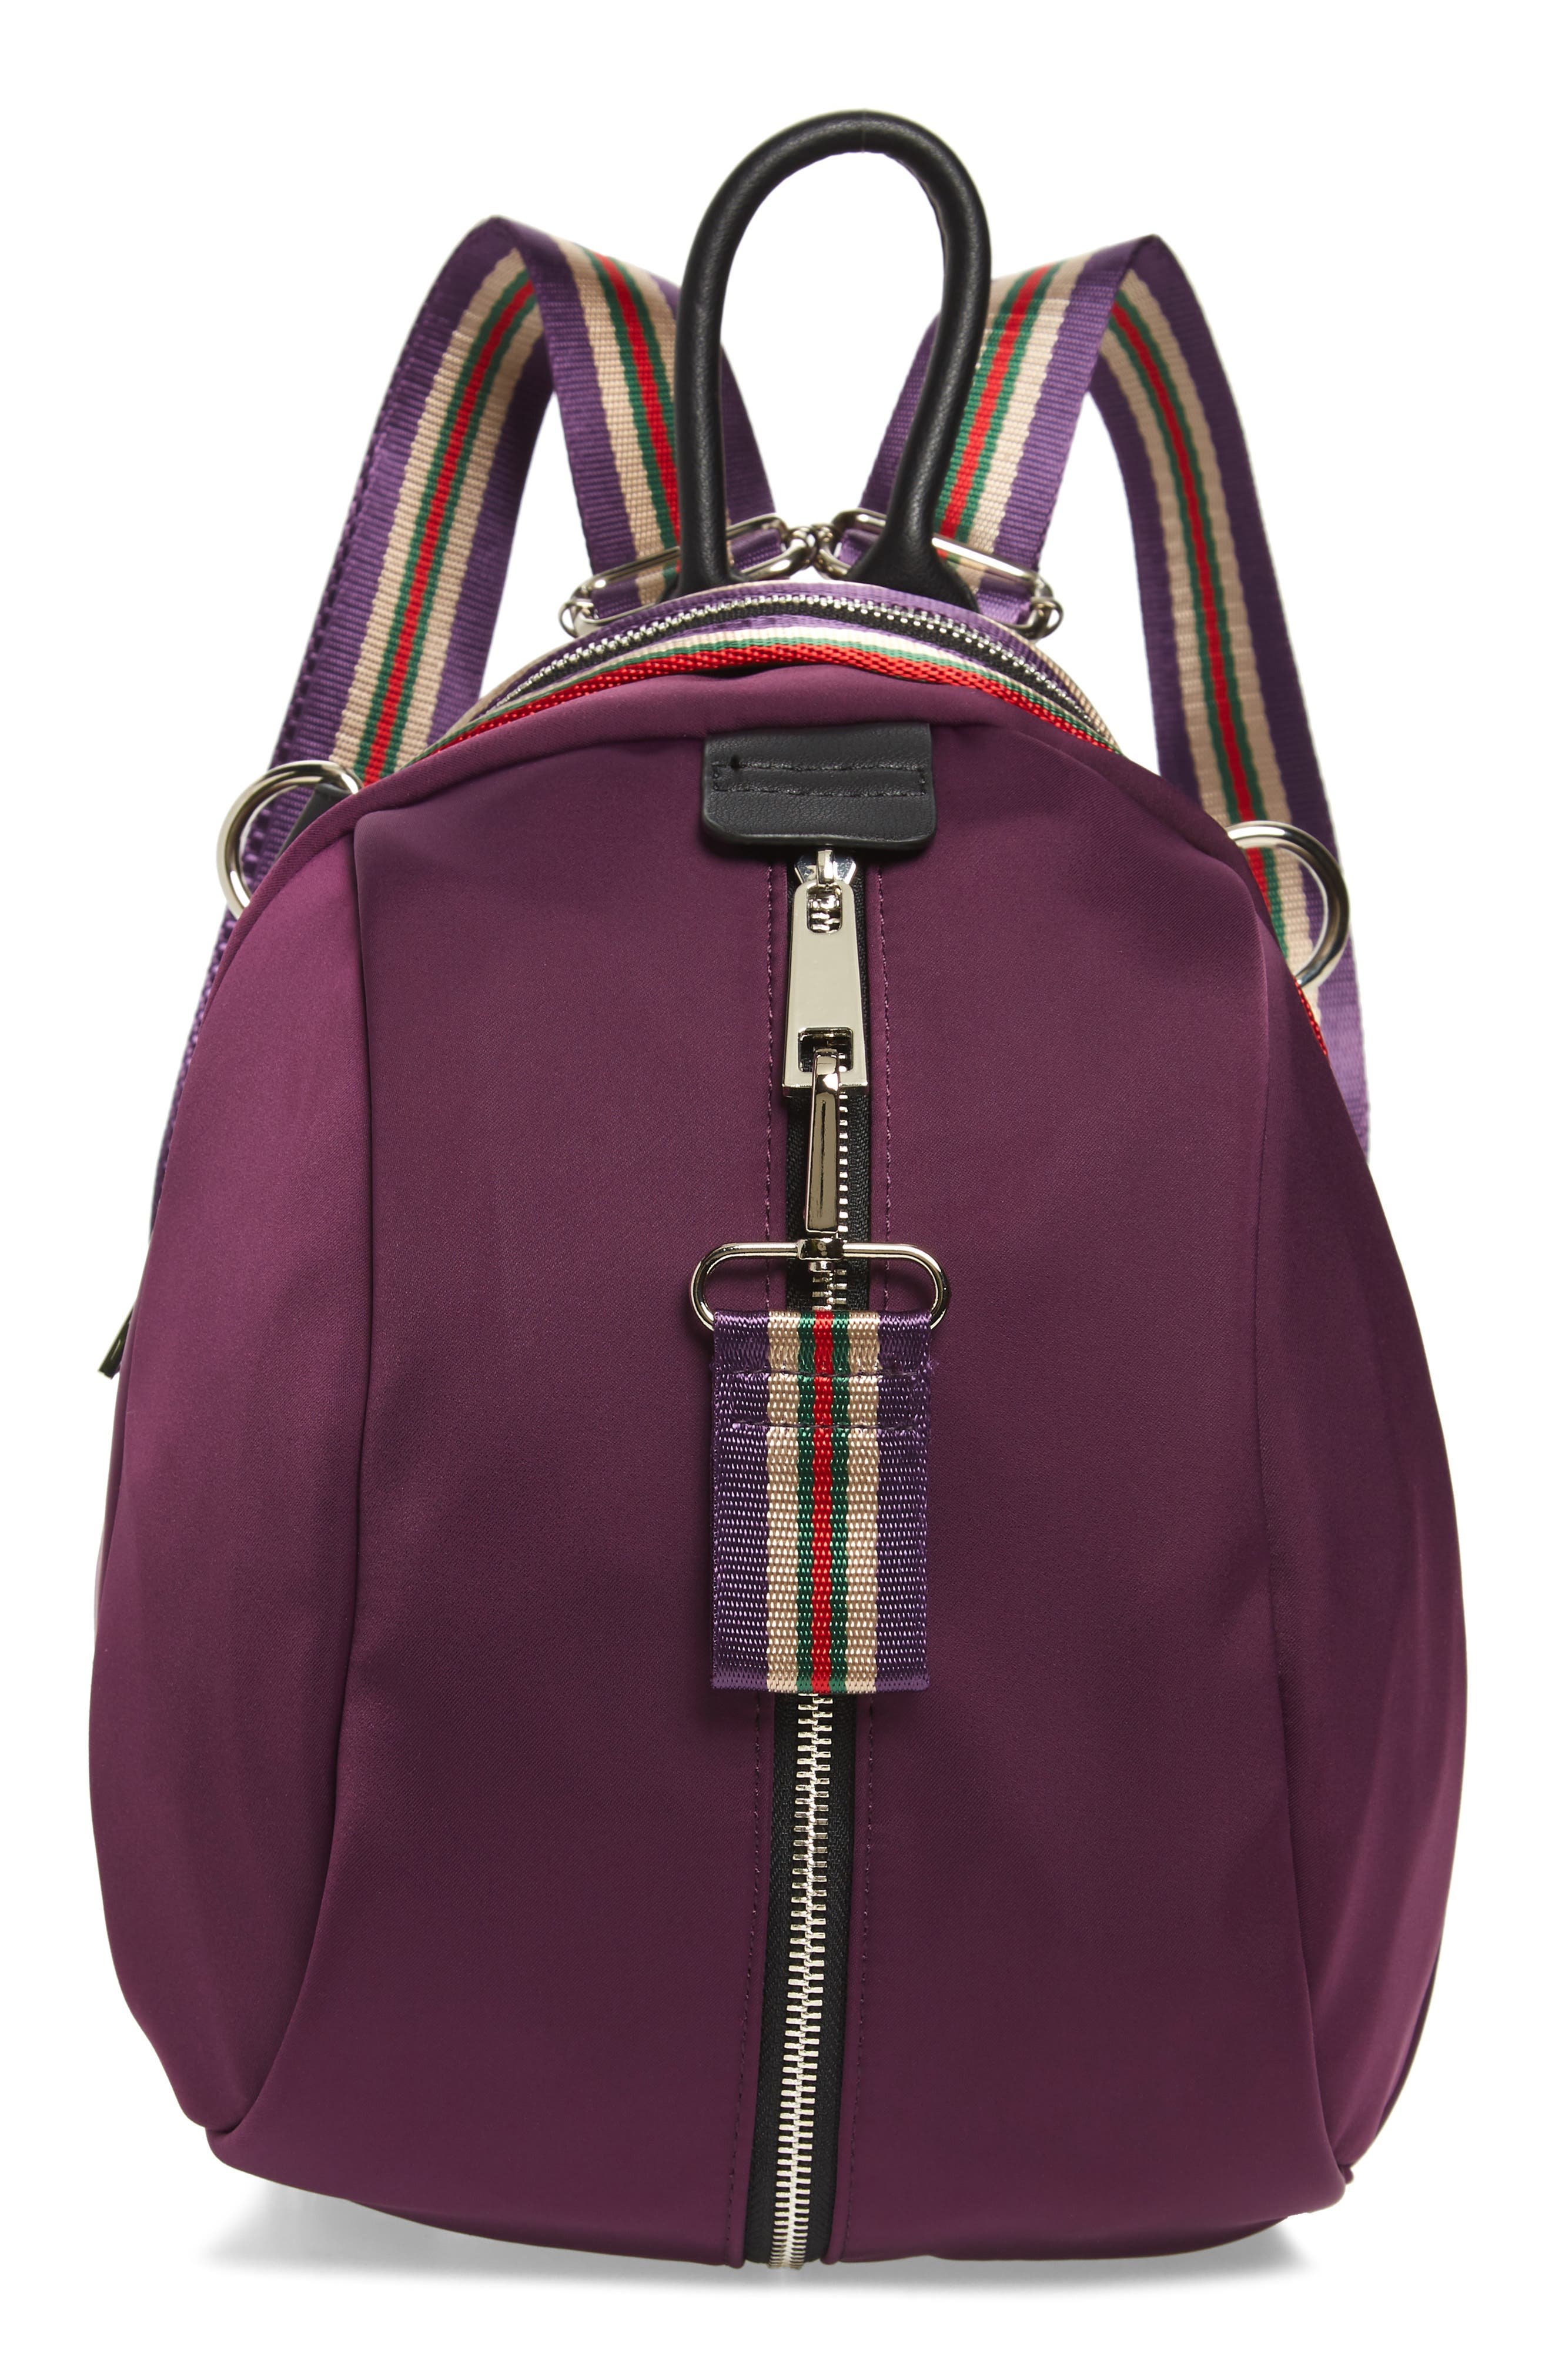 Sondra Roberts Satin Nylon & Webbing Convertible Backpack - Purple